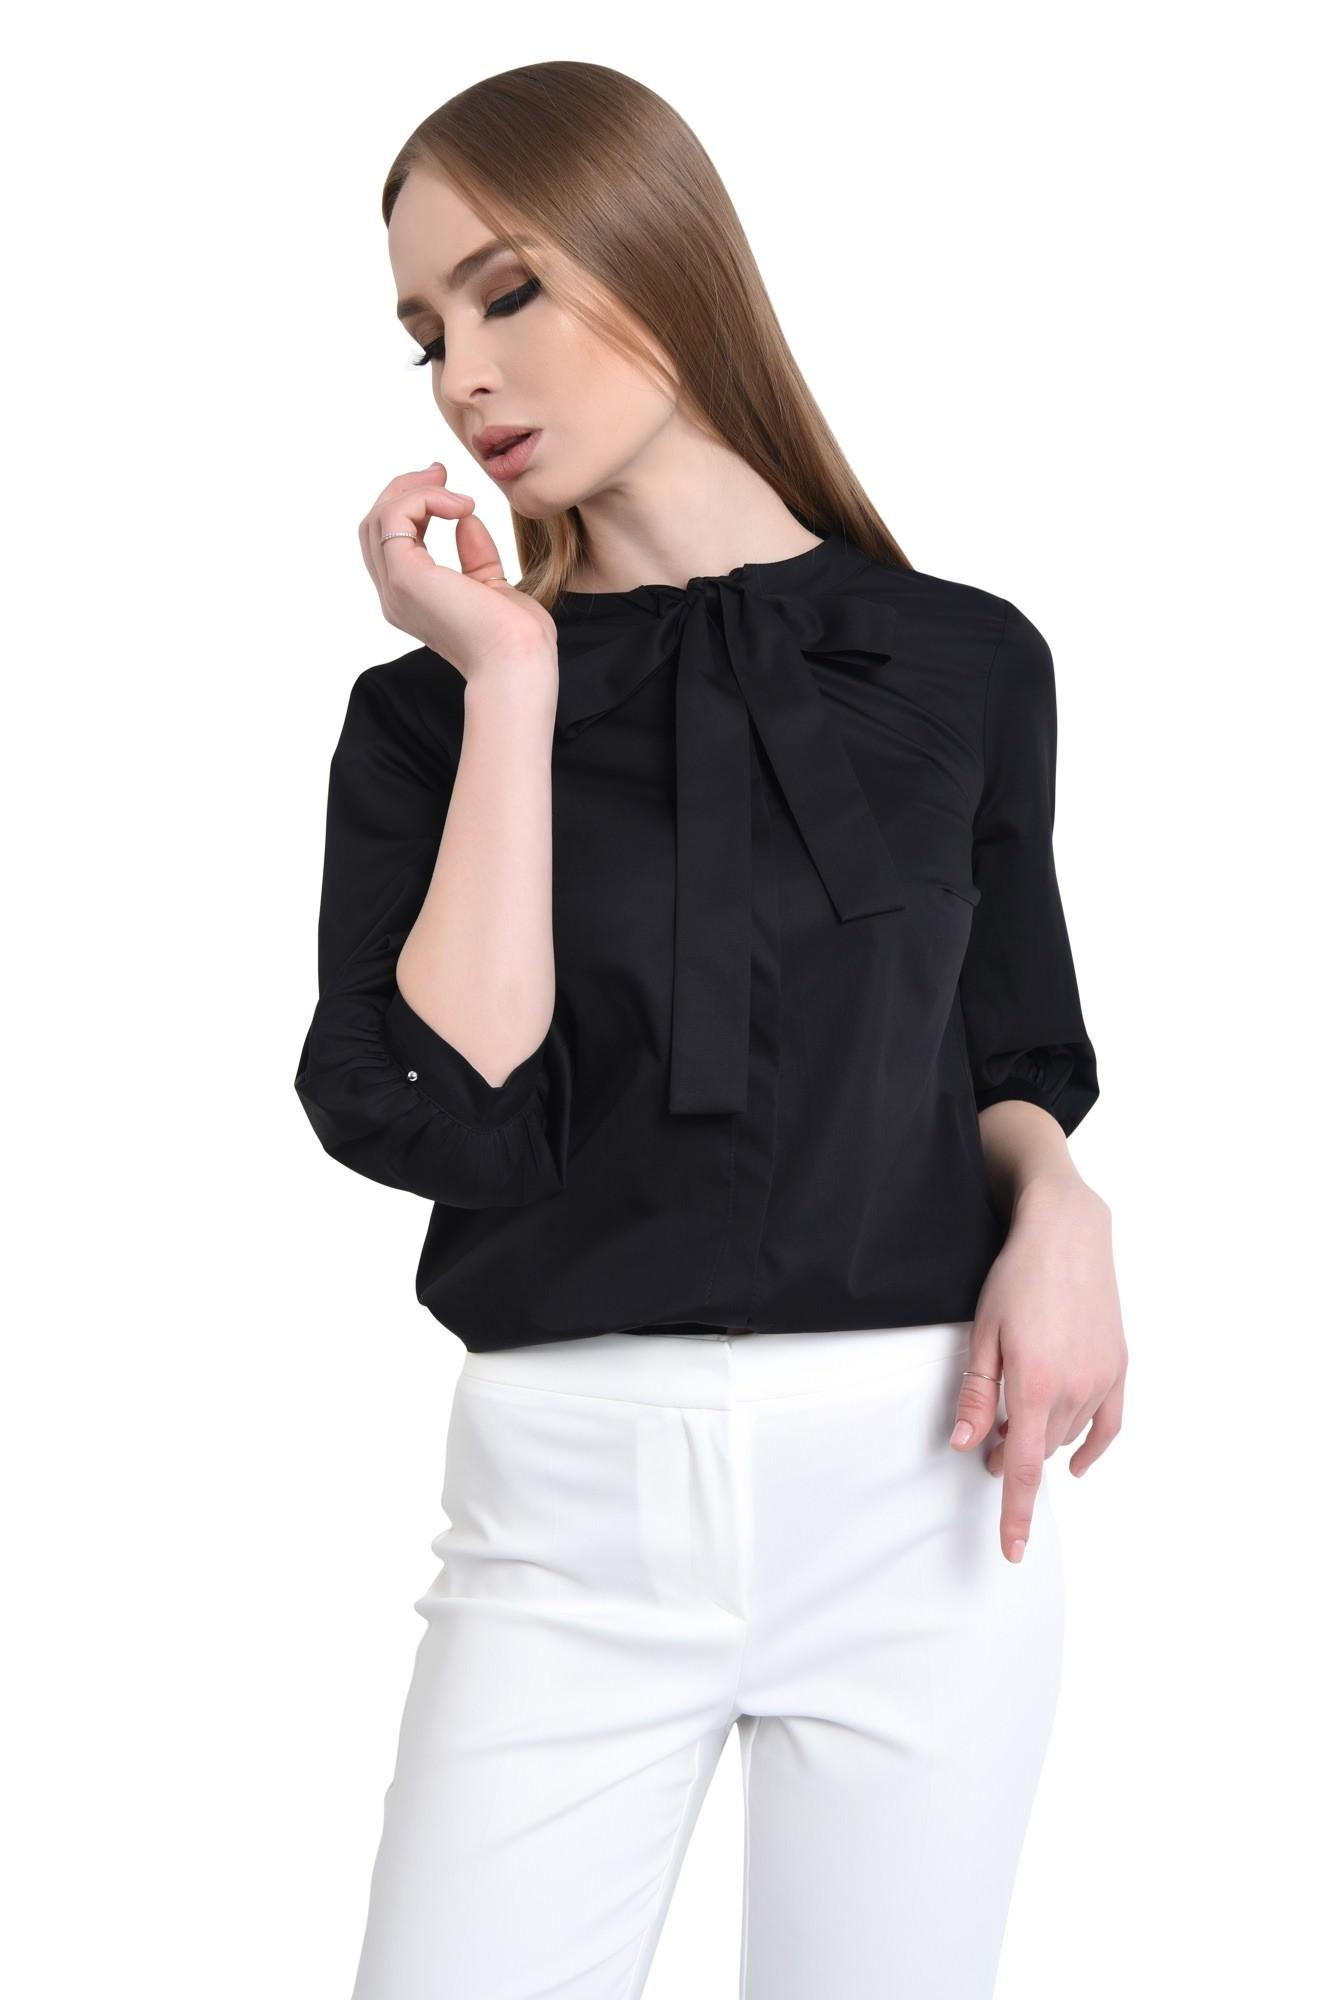 0 - Bluza casual, negru, bumbac, maneci midi